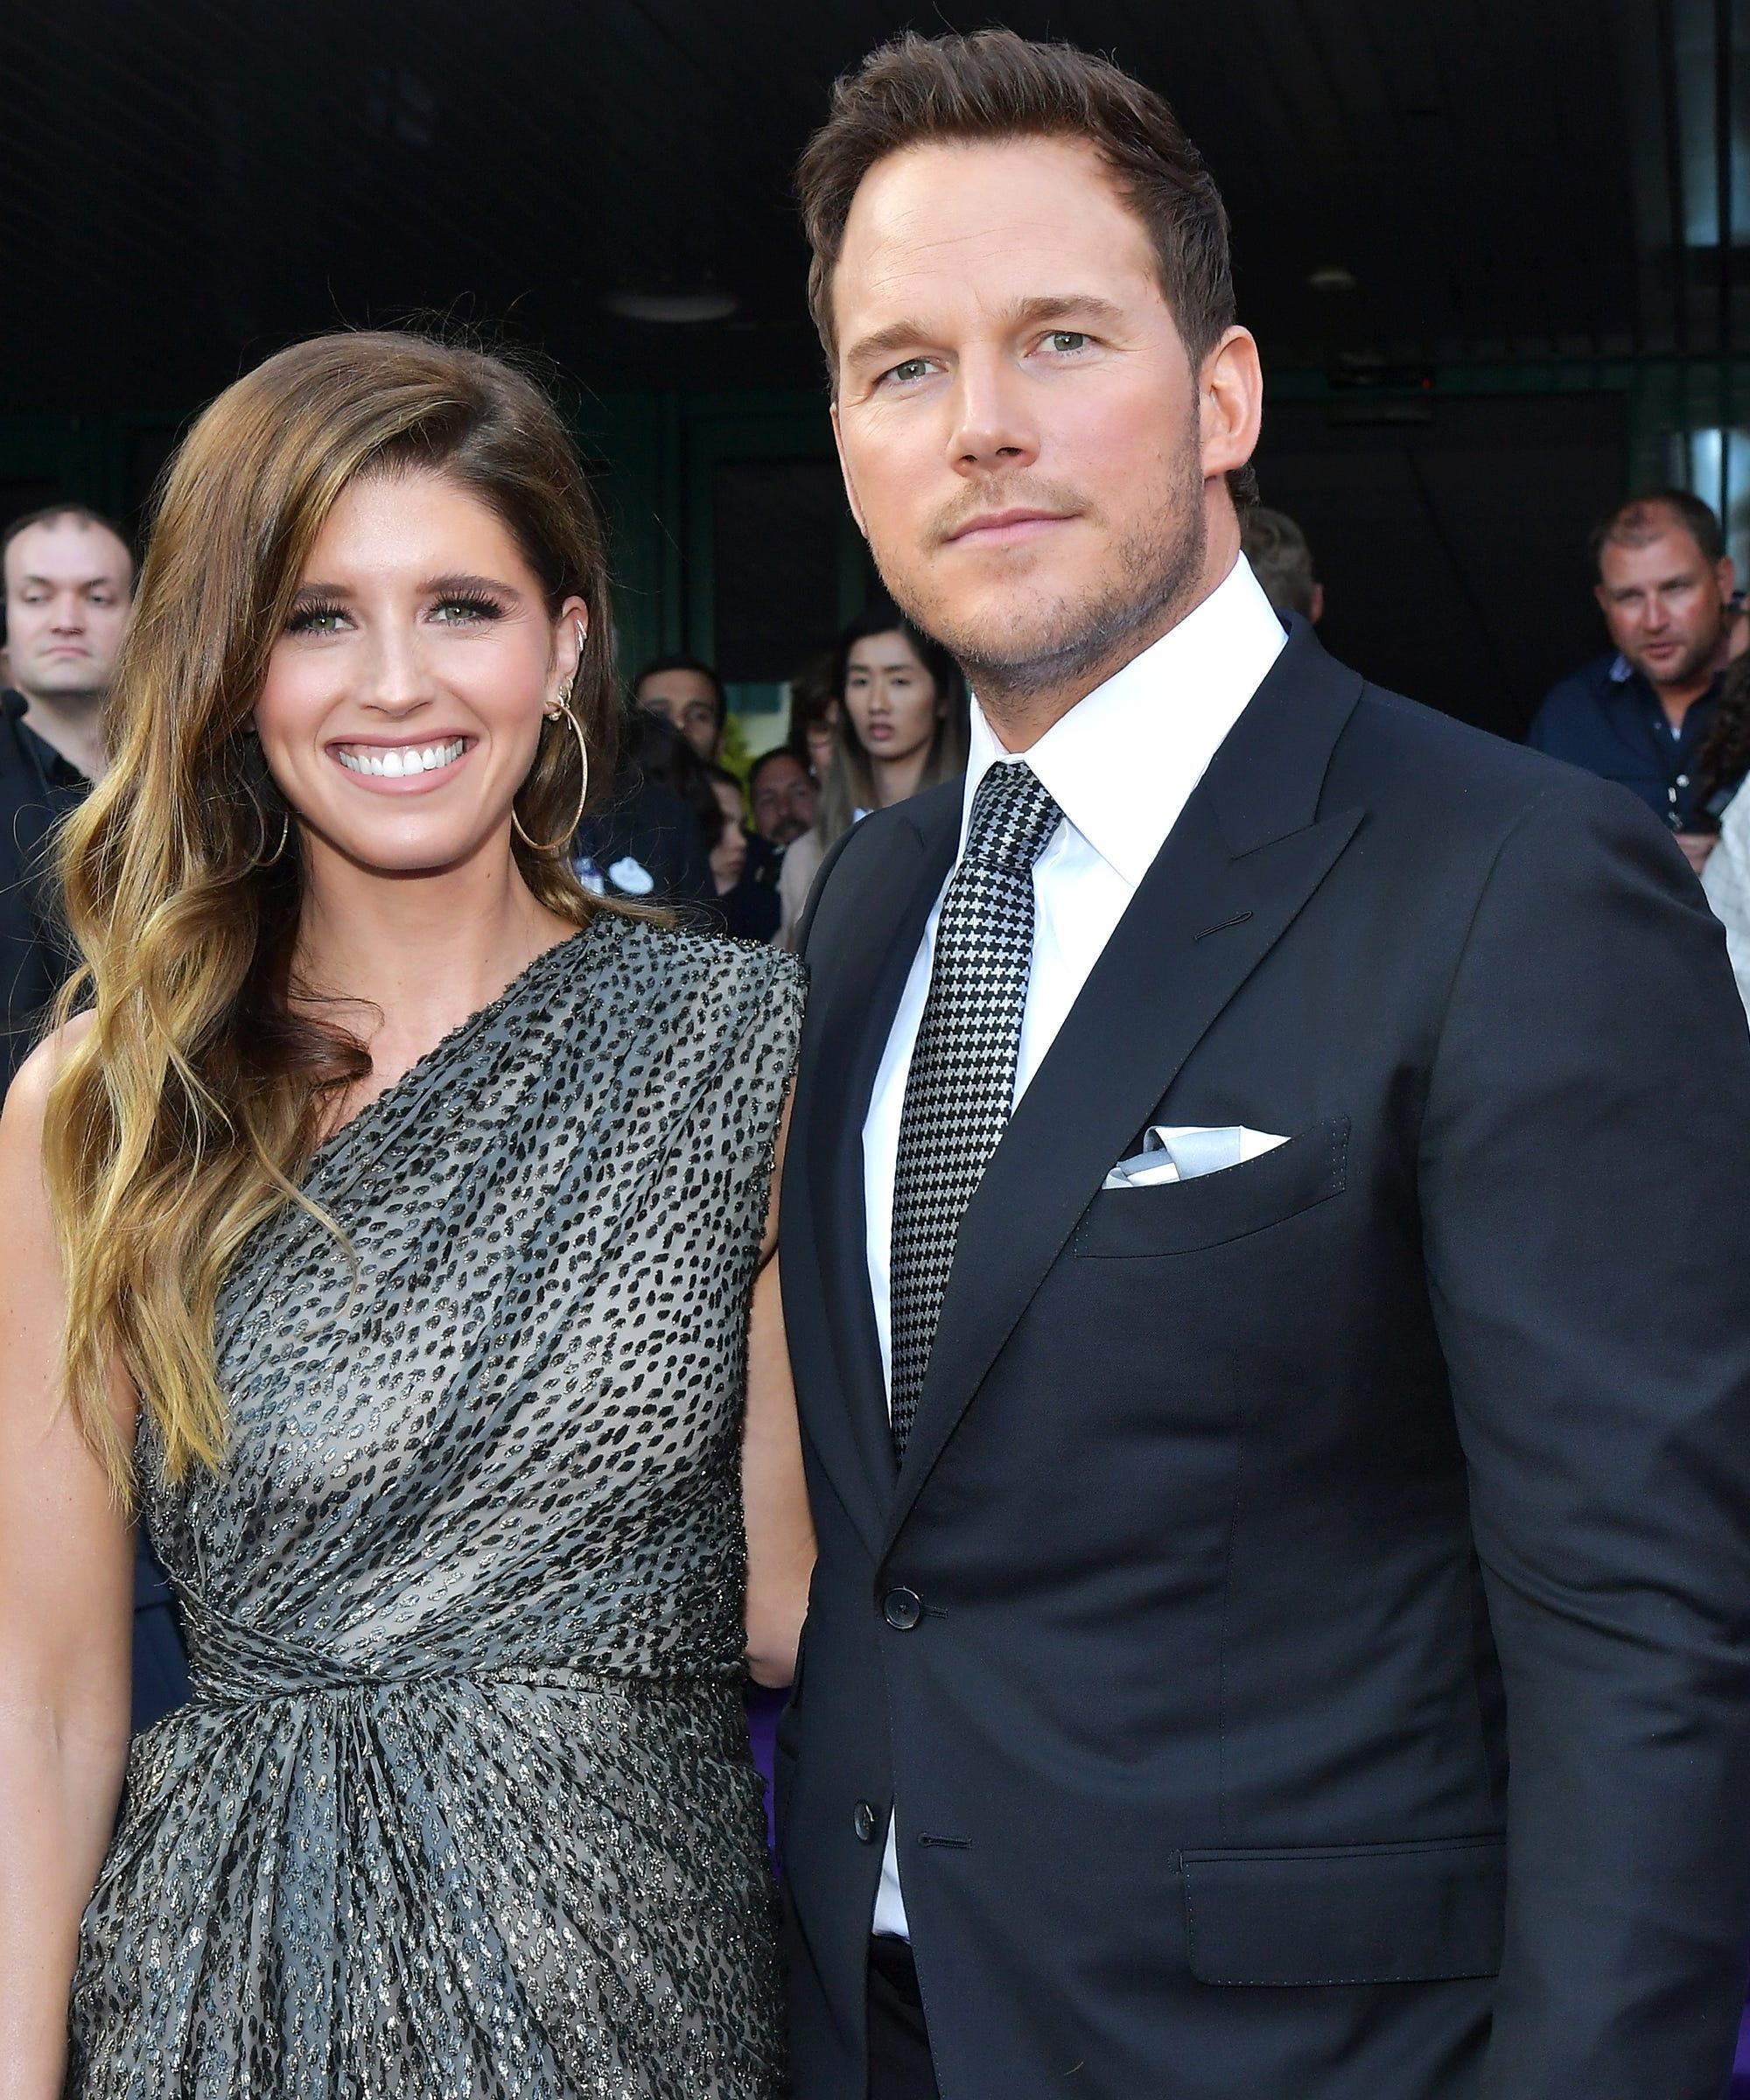 Everything We Know About Chris Pratt & Katherine Schwarzenegger's Wedding